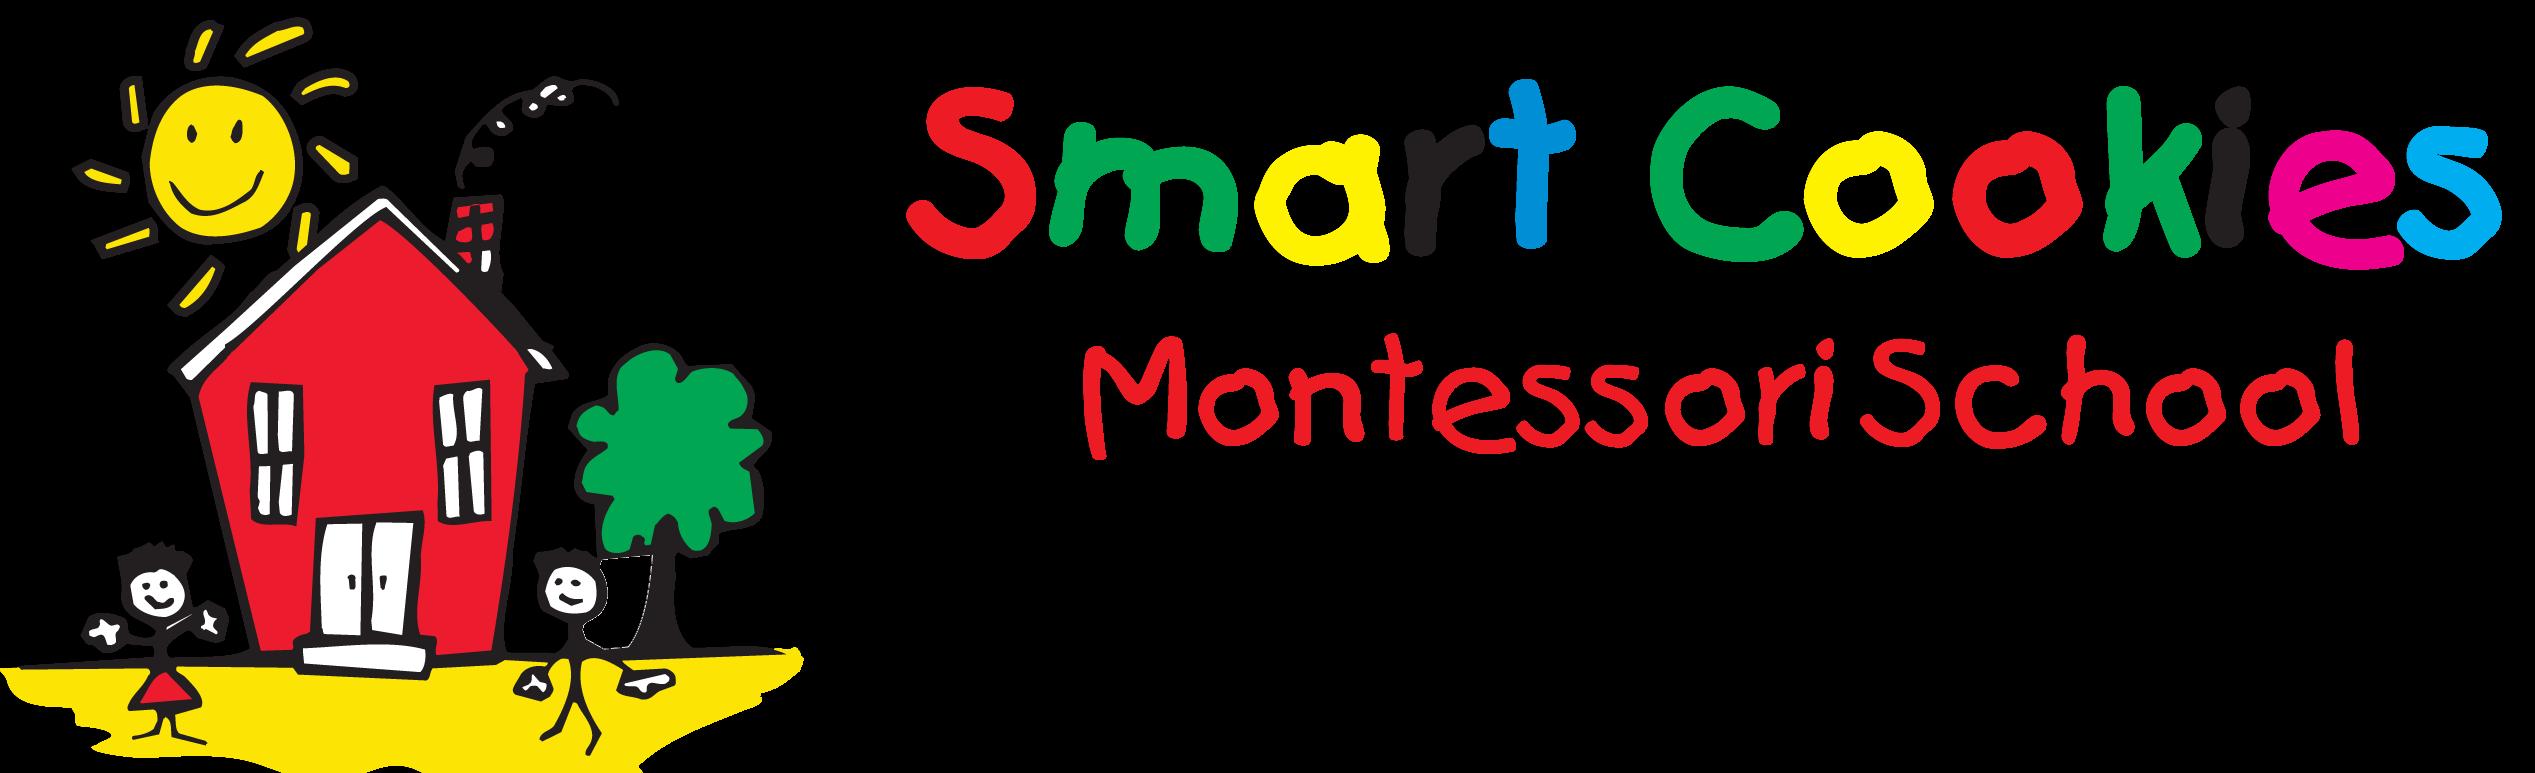 SMART COOKIES MONTESSORI